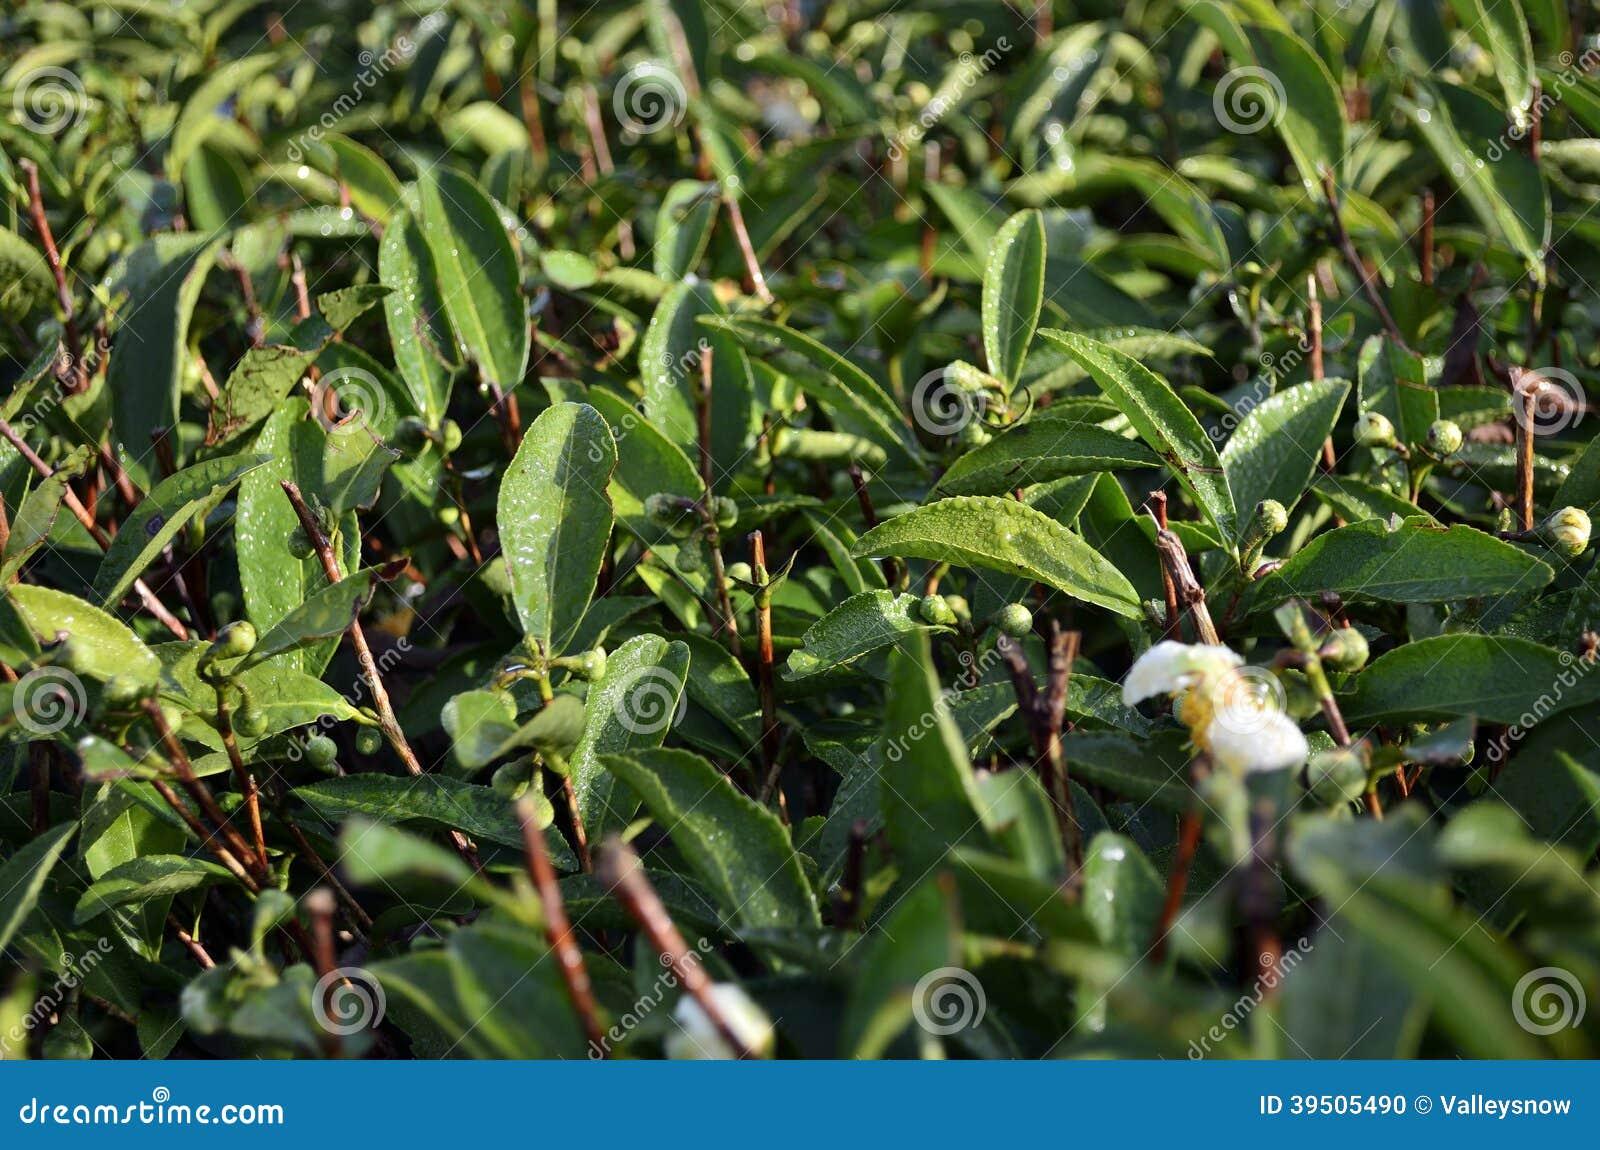 Wuyi Rock tea leaves